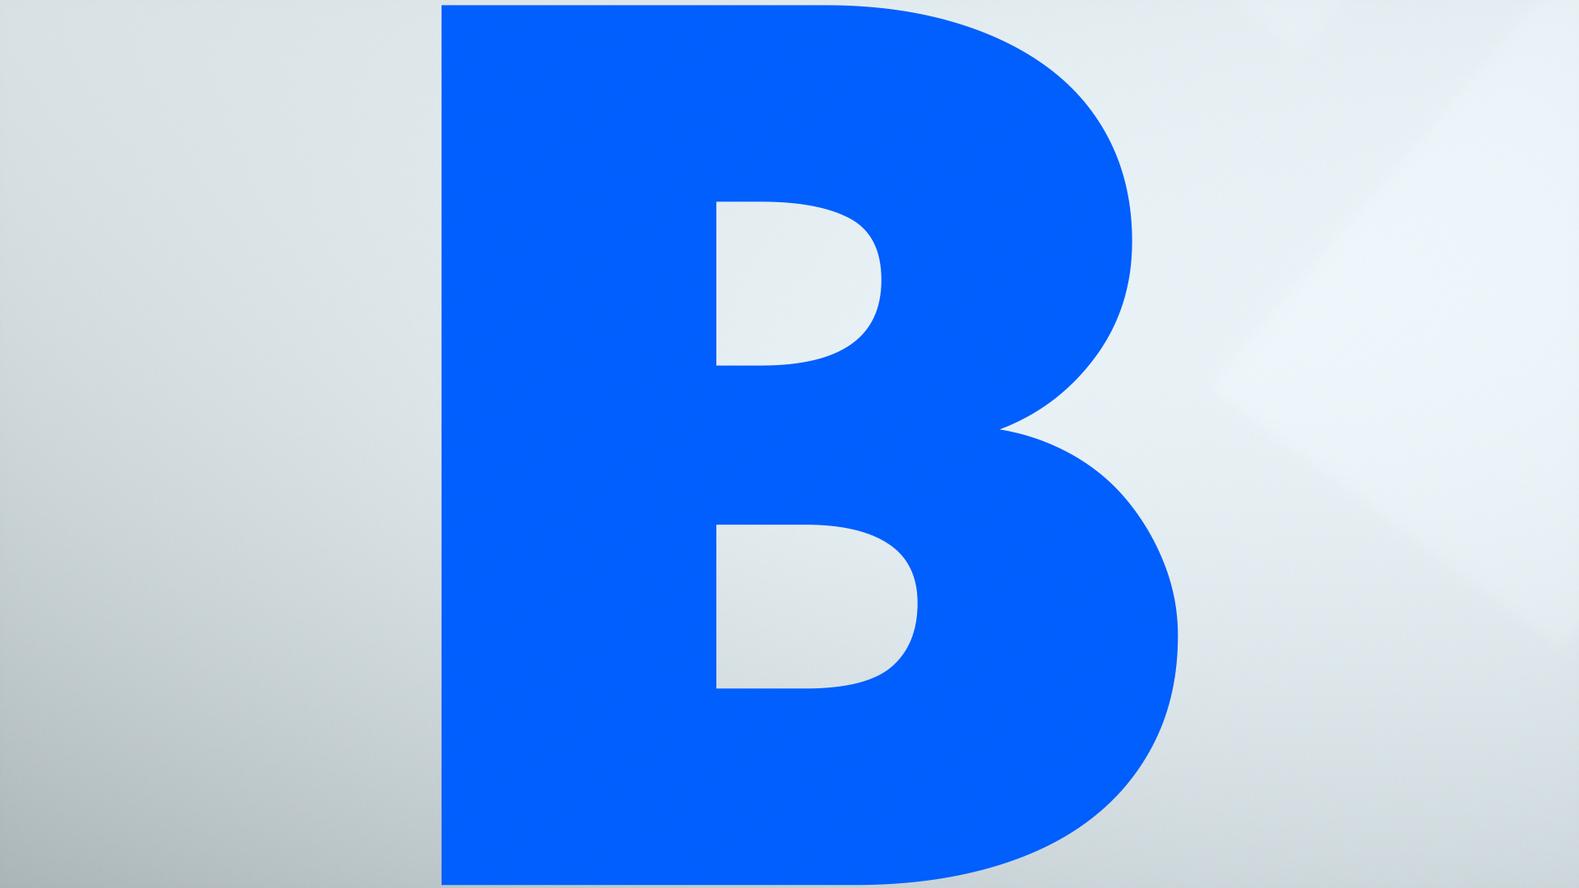 blue_introB_5994.216074.png